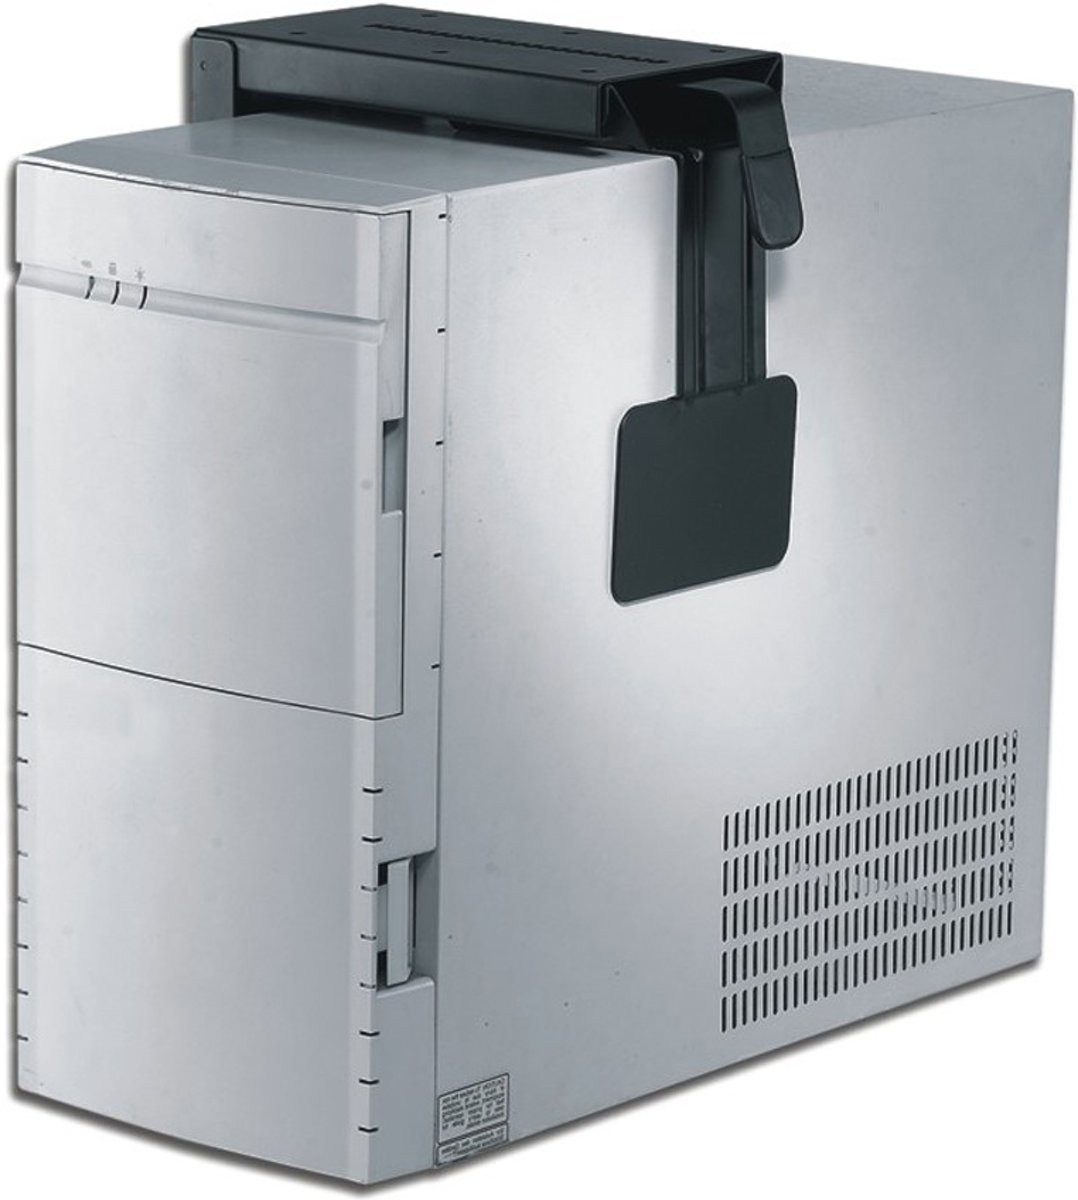 Newstar PC bureausteun kopen